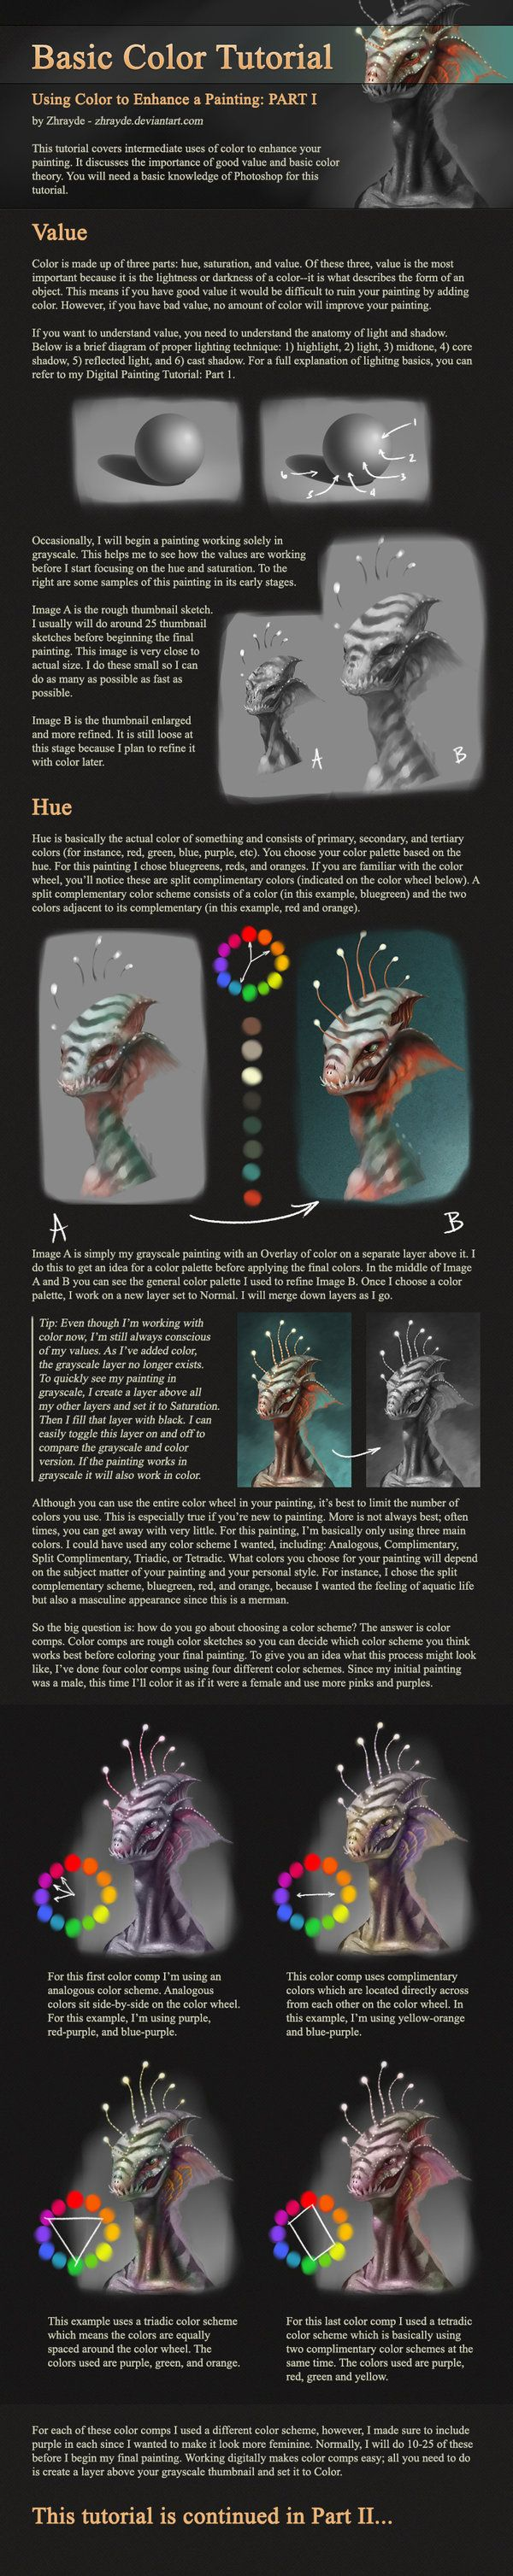 Basic Color Tutorial - Part 1 by Zhrayde [dA]